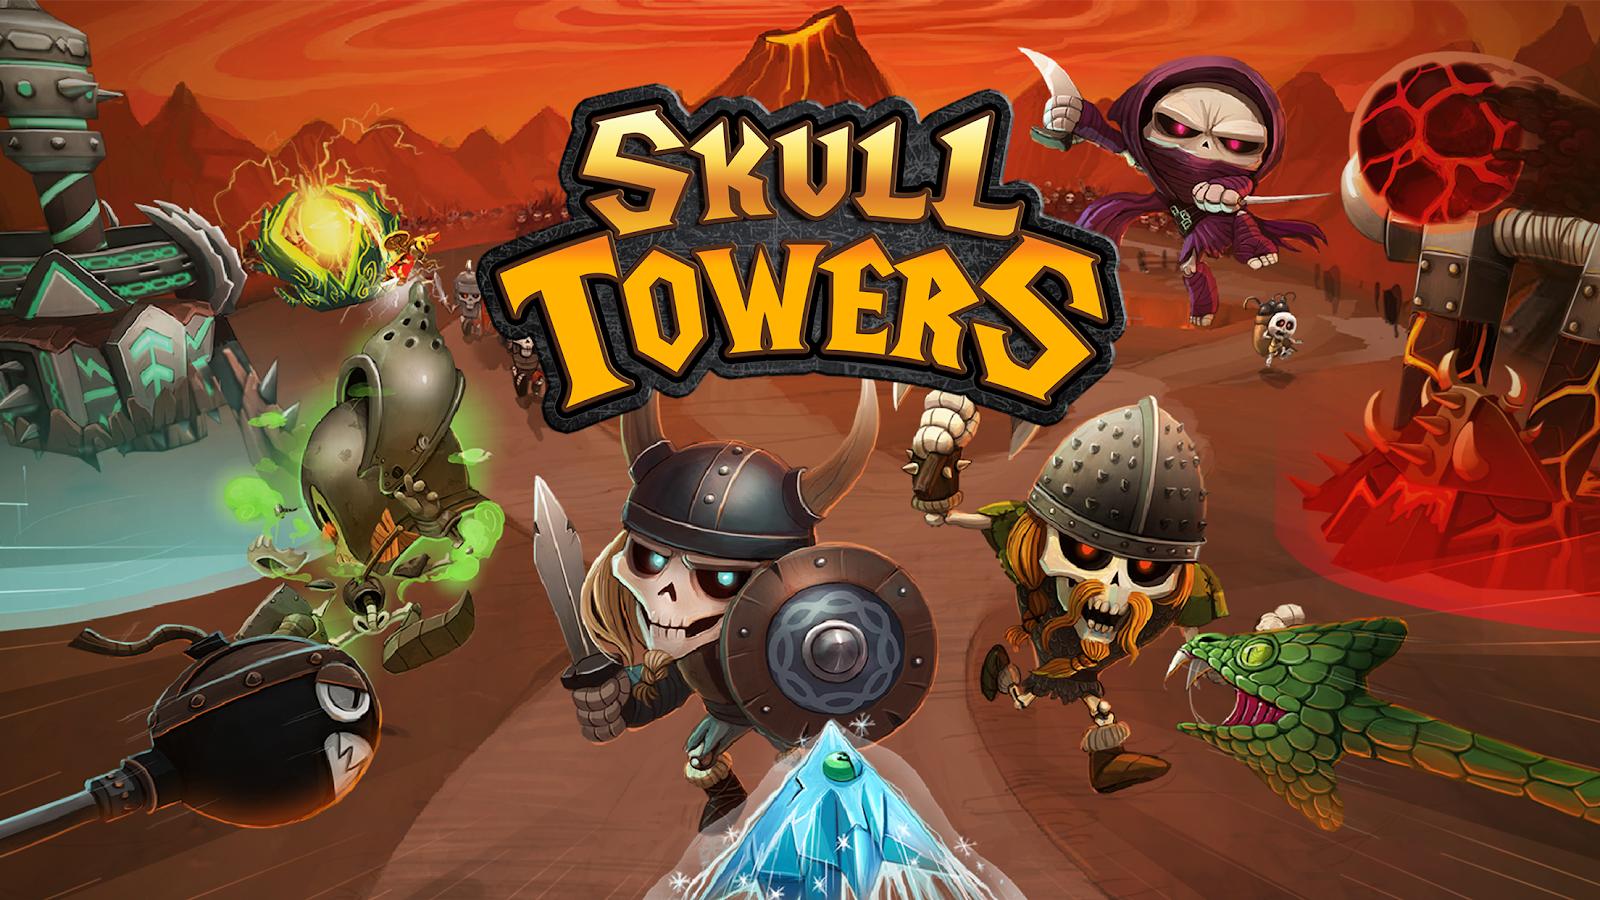 2ed77f8e5ed Skull Towers  Offline Games Castle Defense 1.1.6 APK Download ...